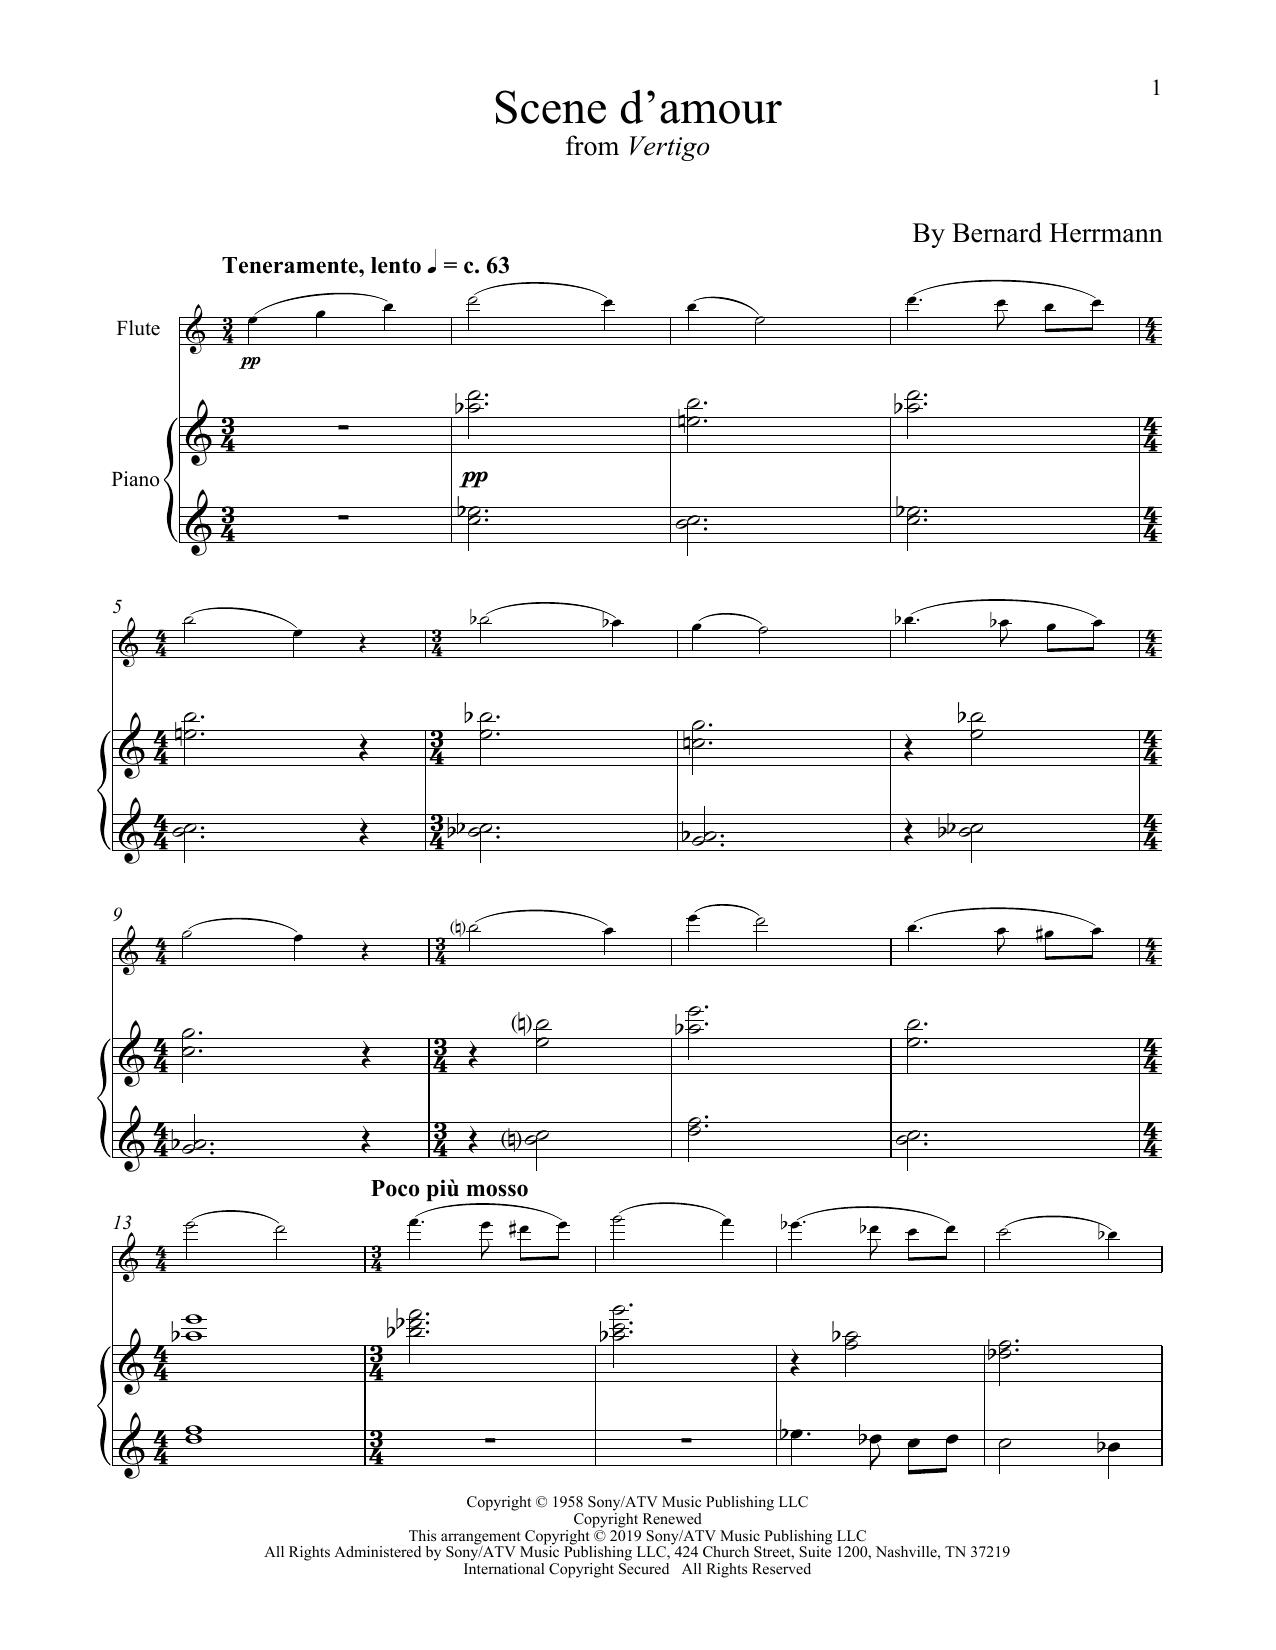 Bernard Hermann Scene D'Amour (from Vertigo) sheet music notes and chords. Download Printable PDF.